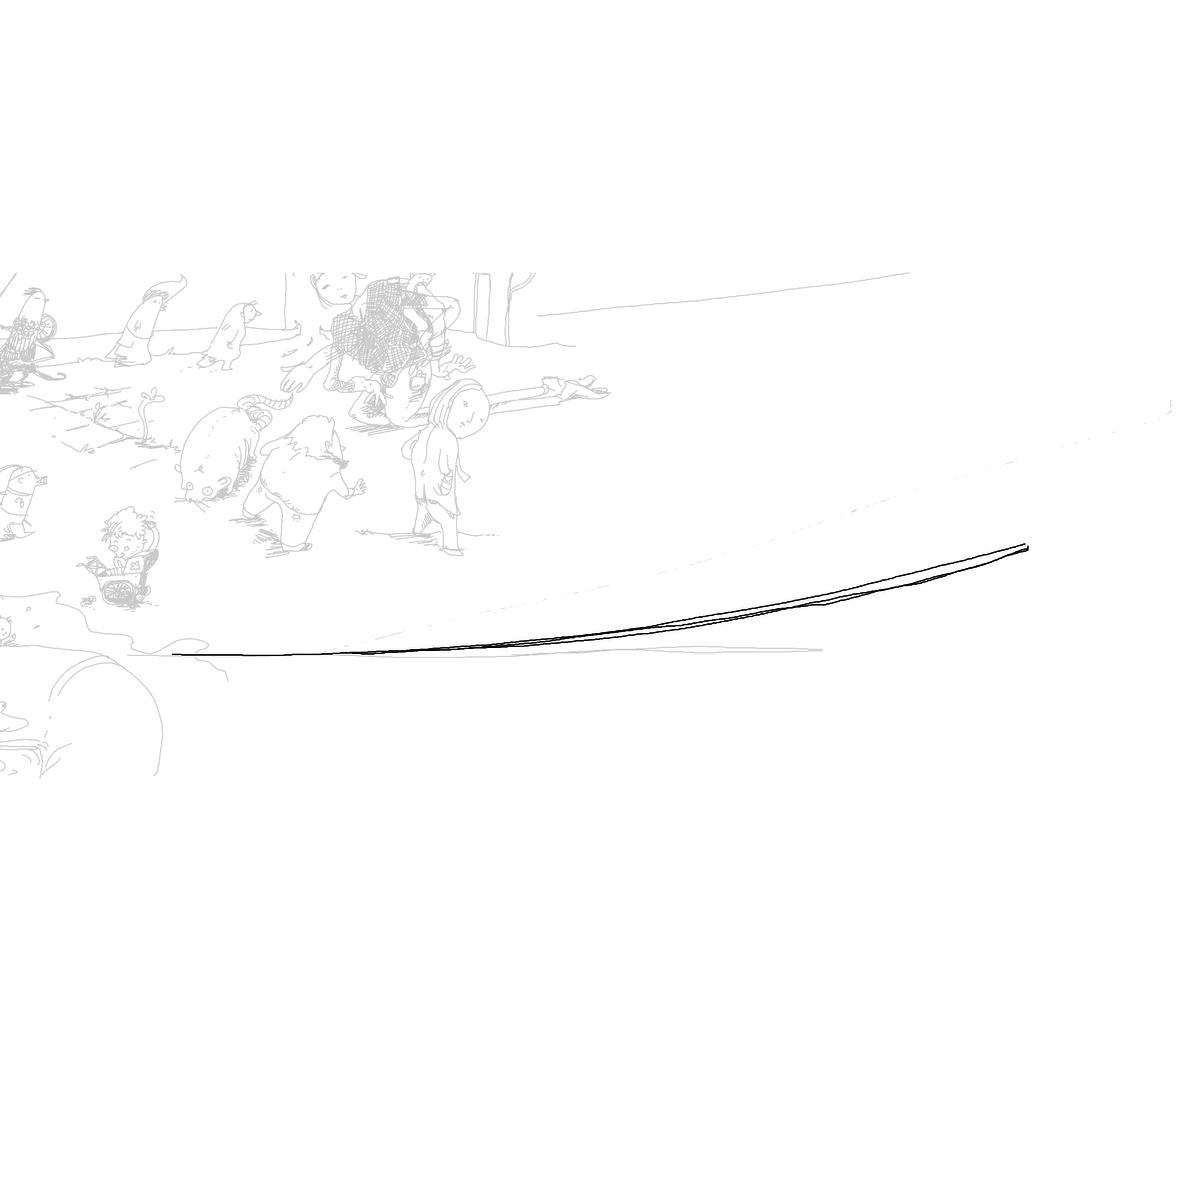 BAAAM drawing#4982 lat:78.7422485351562500lng: -18.1122283935546880